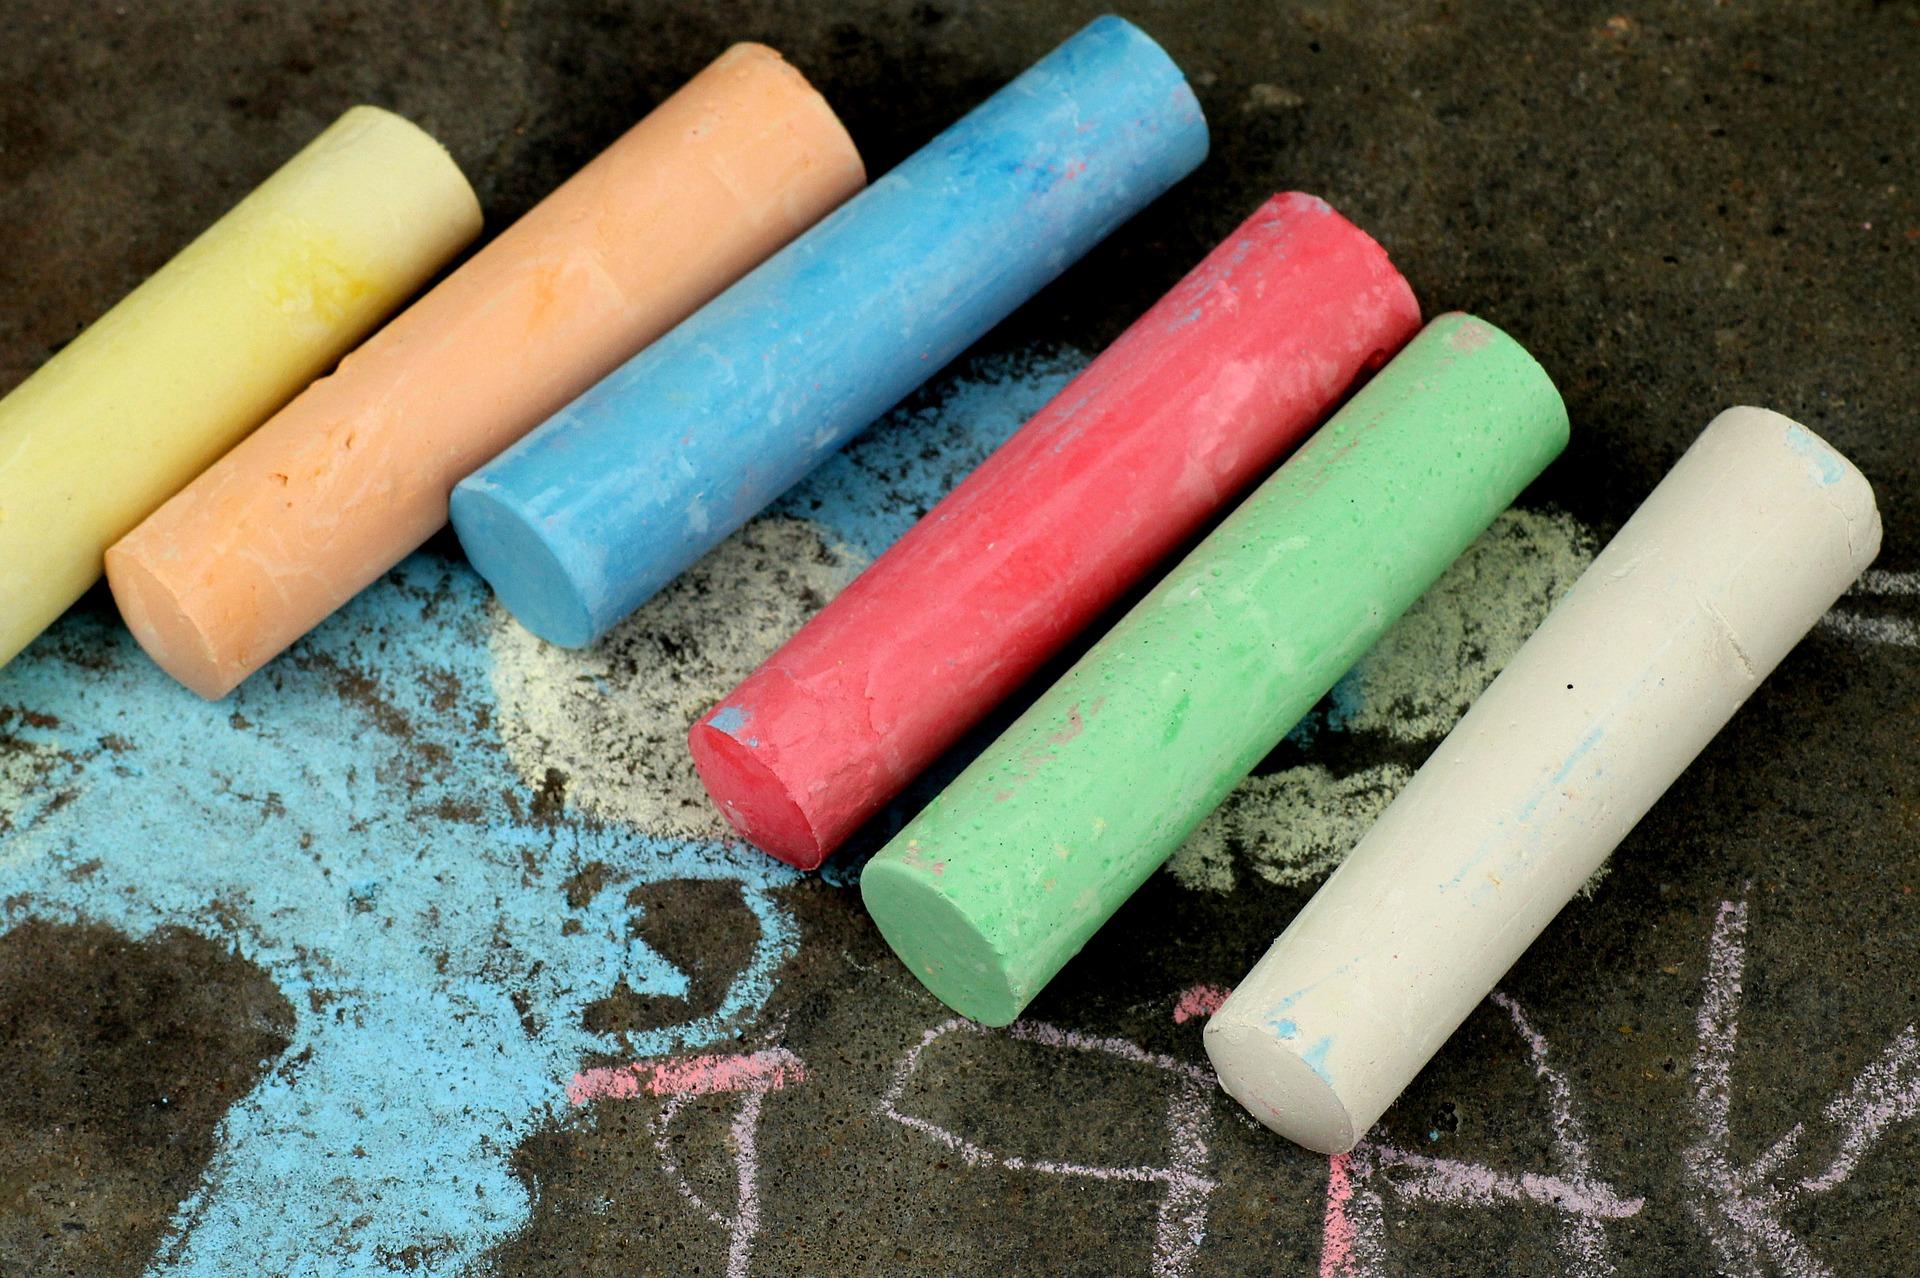 chalk-4161039_1920